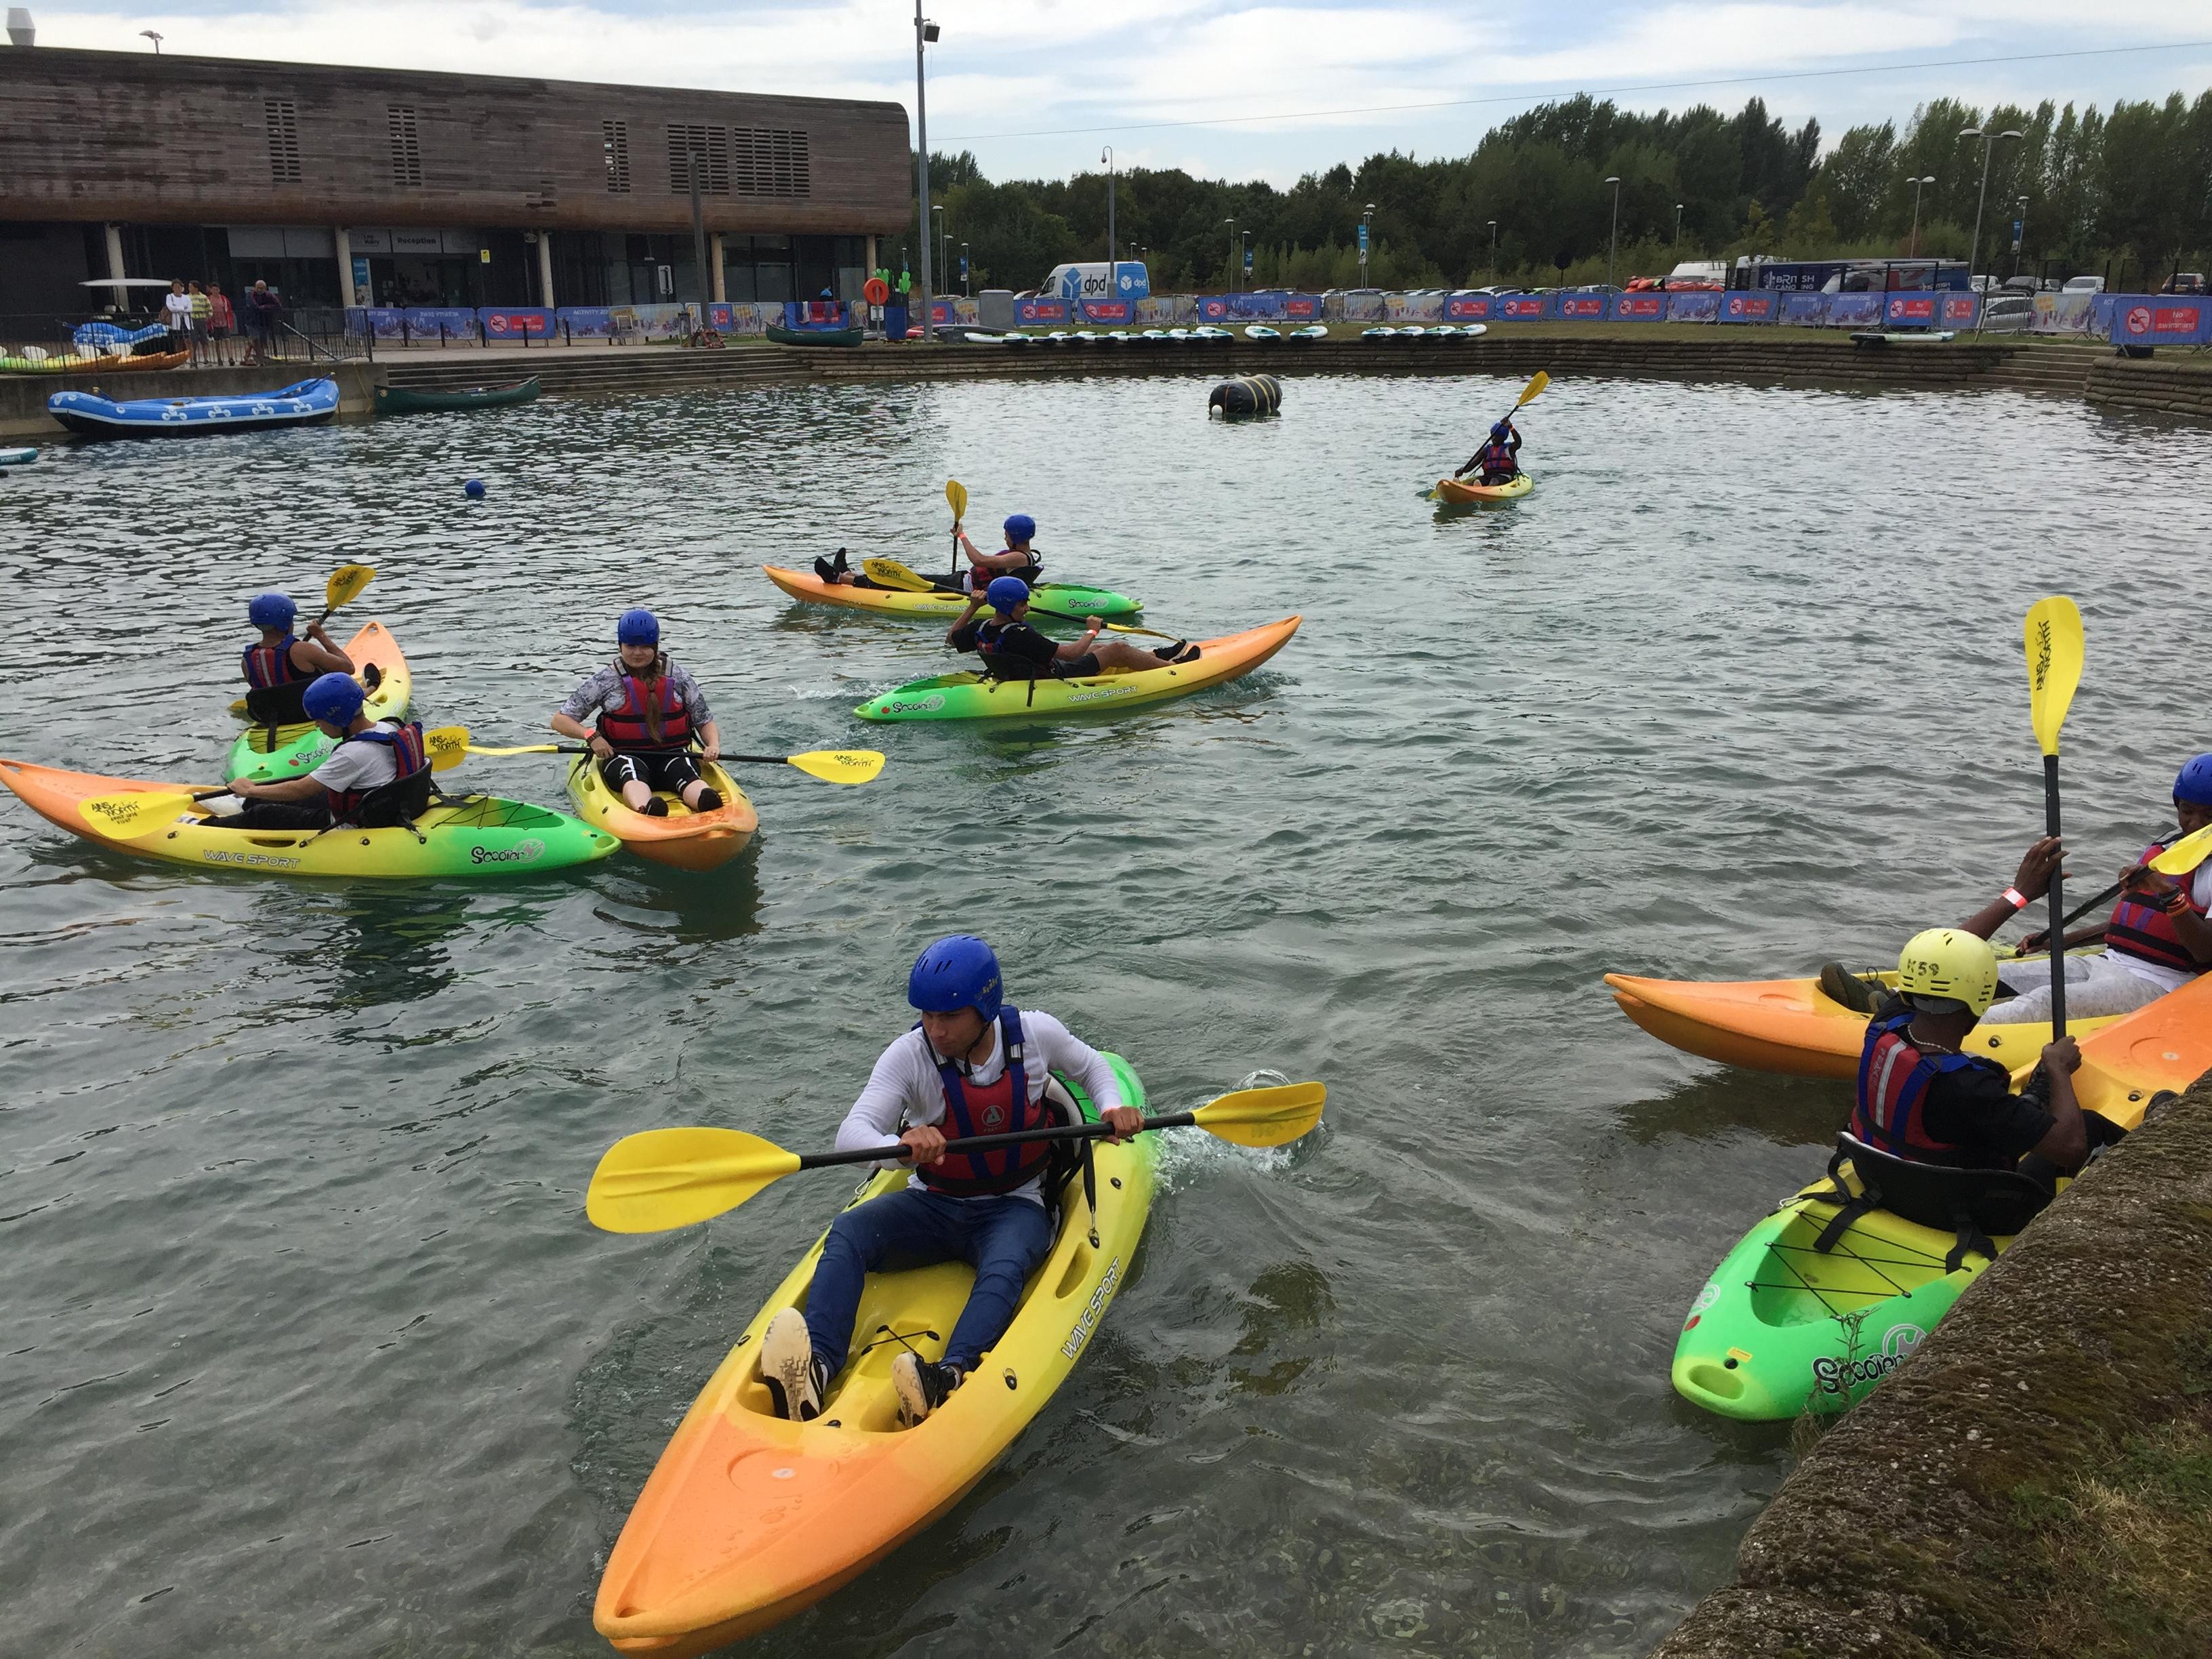 Young refugees and asylum seekers enjoy exploring new activities!